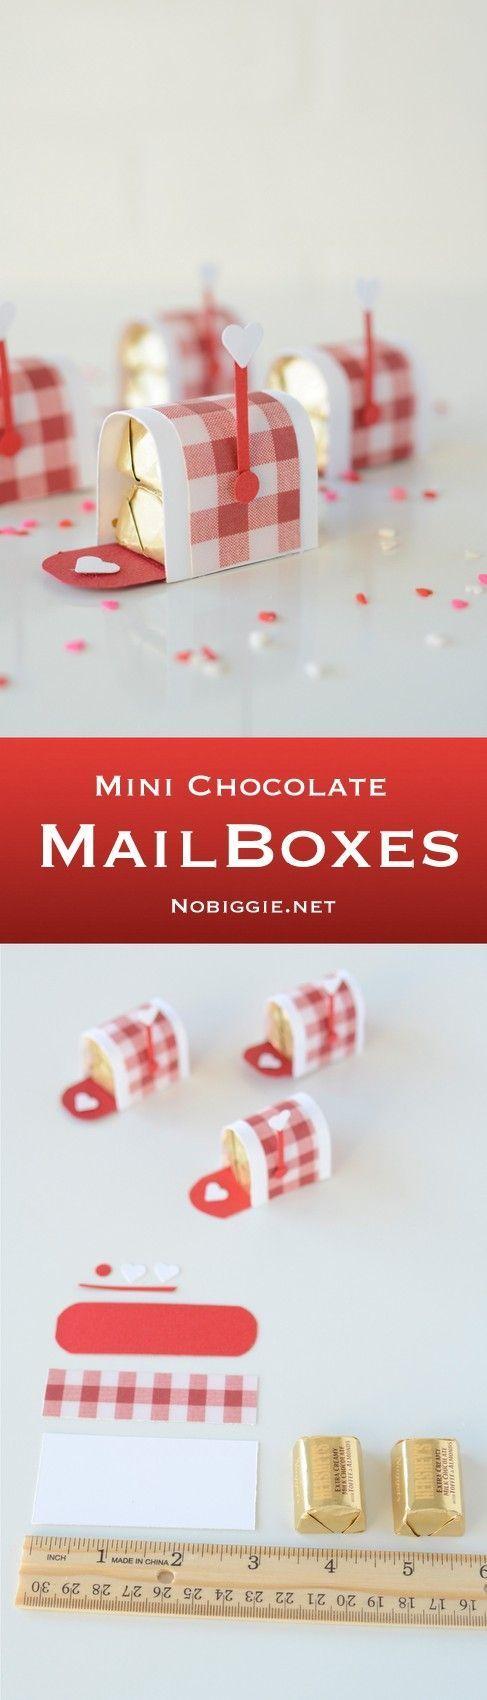 Schokoladengeschenk | #diy #selbermachen #geschenke #geschenkideen #inspiration